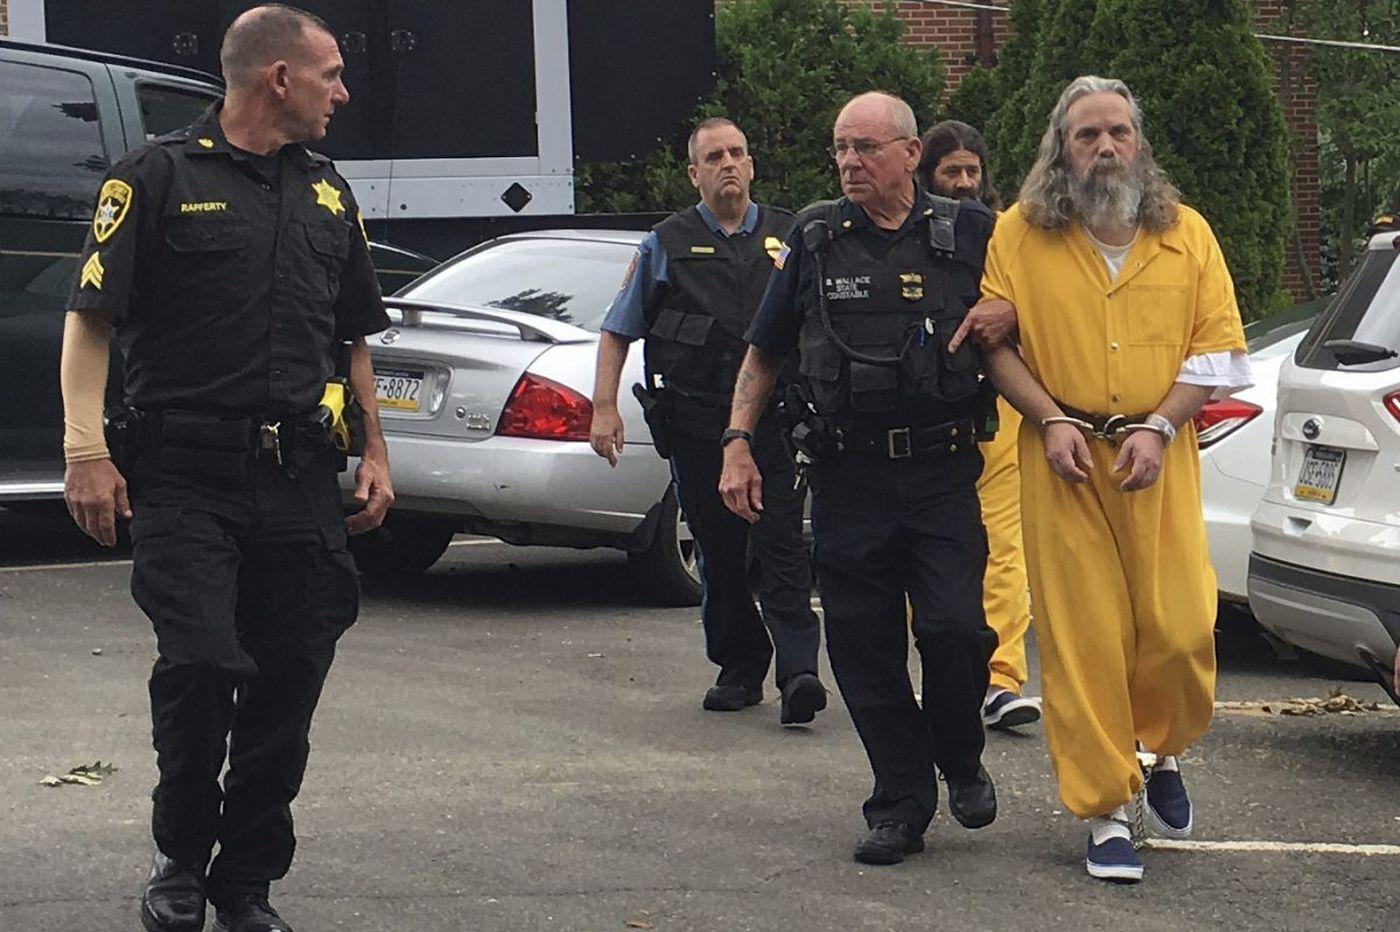 Lee Kaplan, abuser of sisters, sentenced to up to 87 years in jail